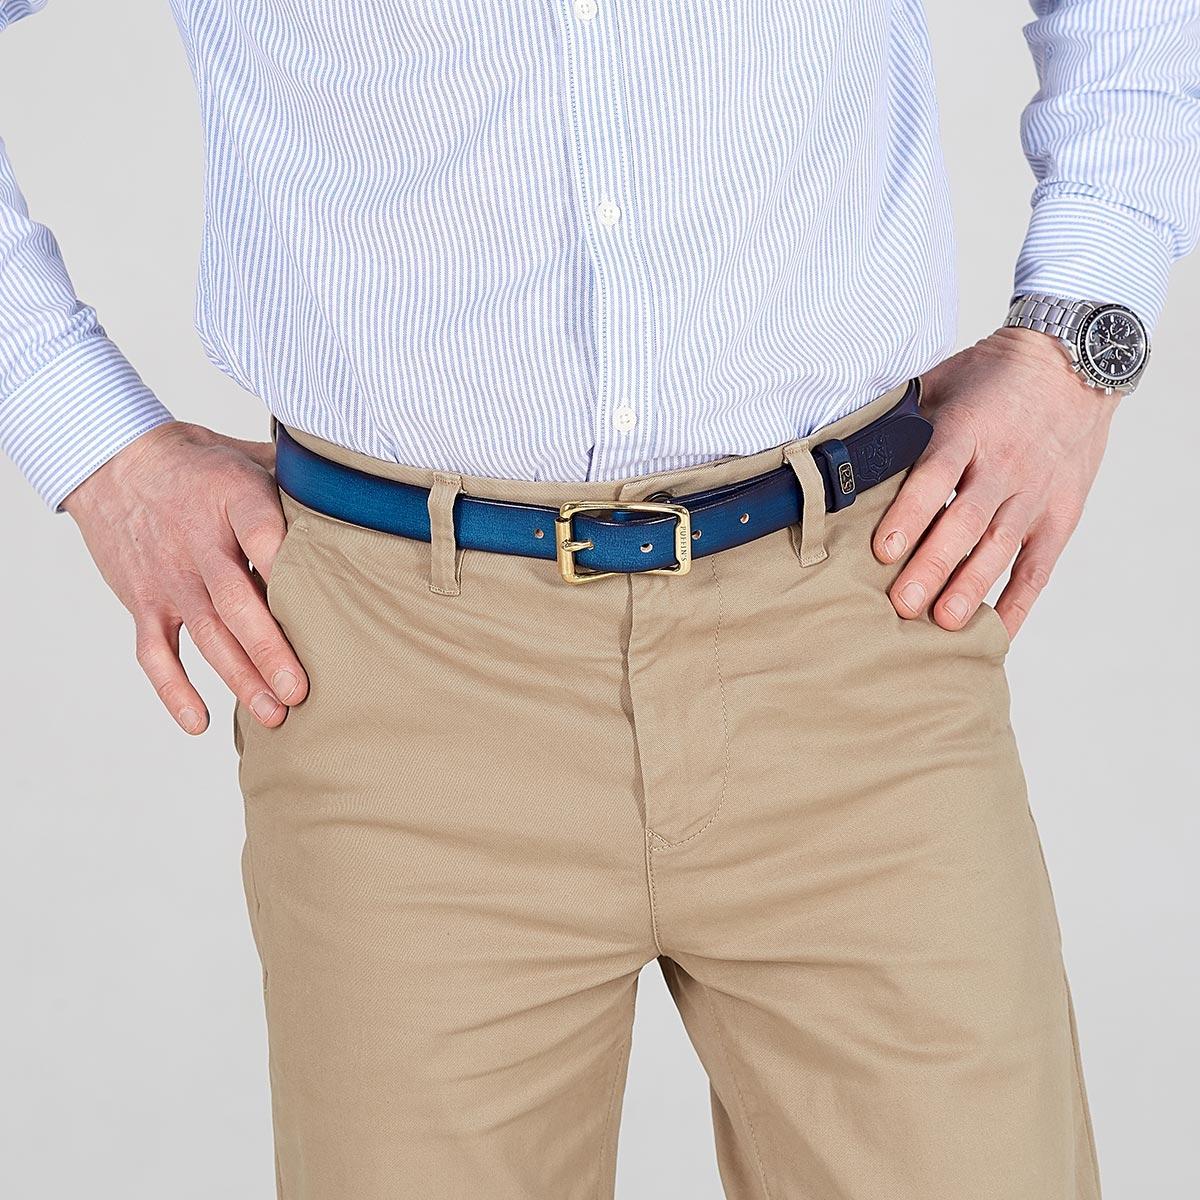 Luxury narrow belt 25mm with patina sapphire blue